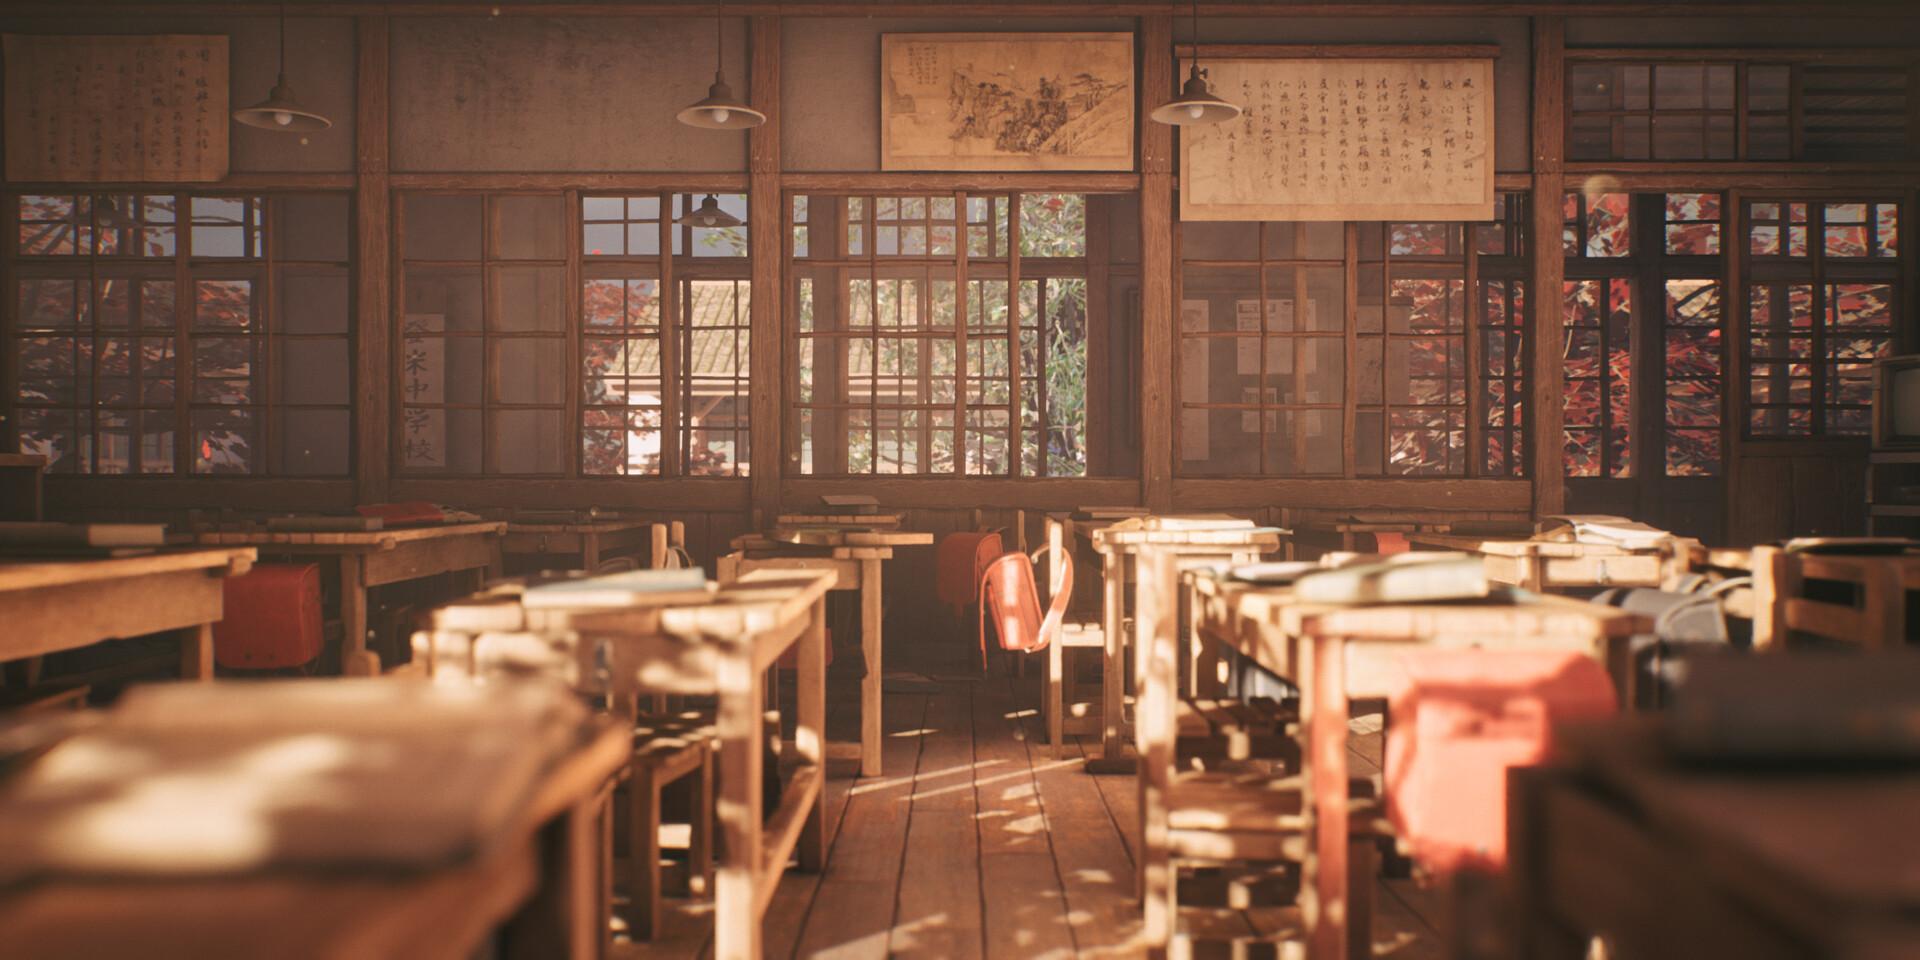 Agancg_UE4_tutorial_Old-Japanese-Classroom04